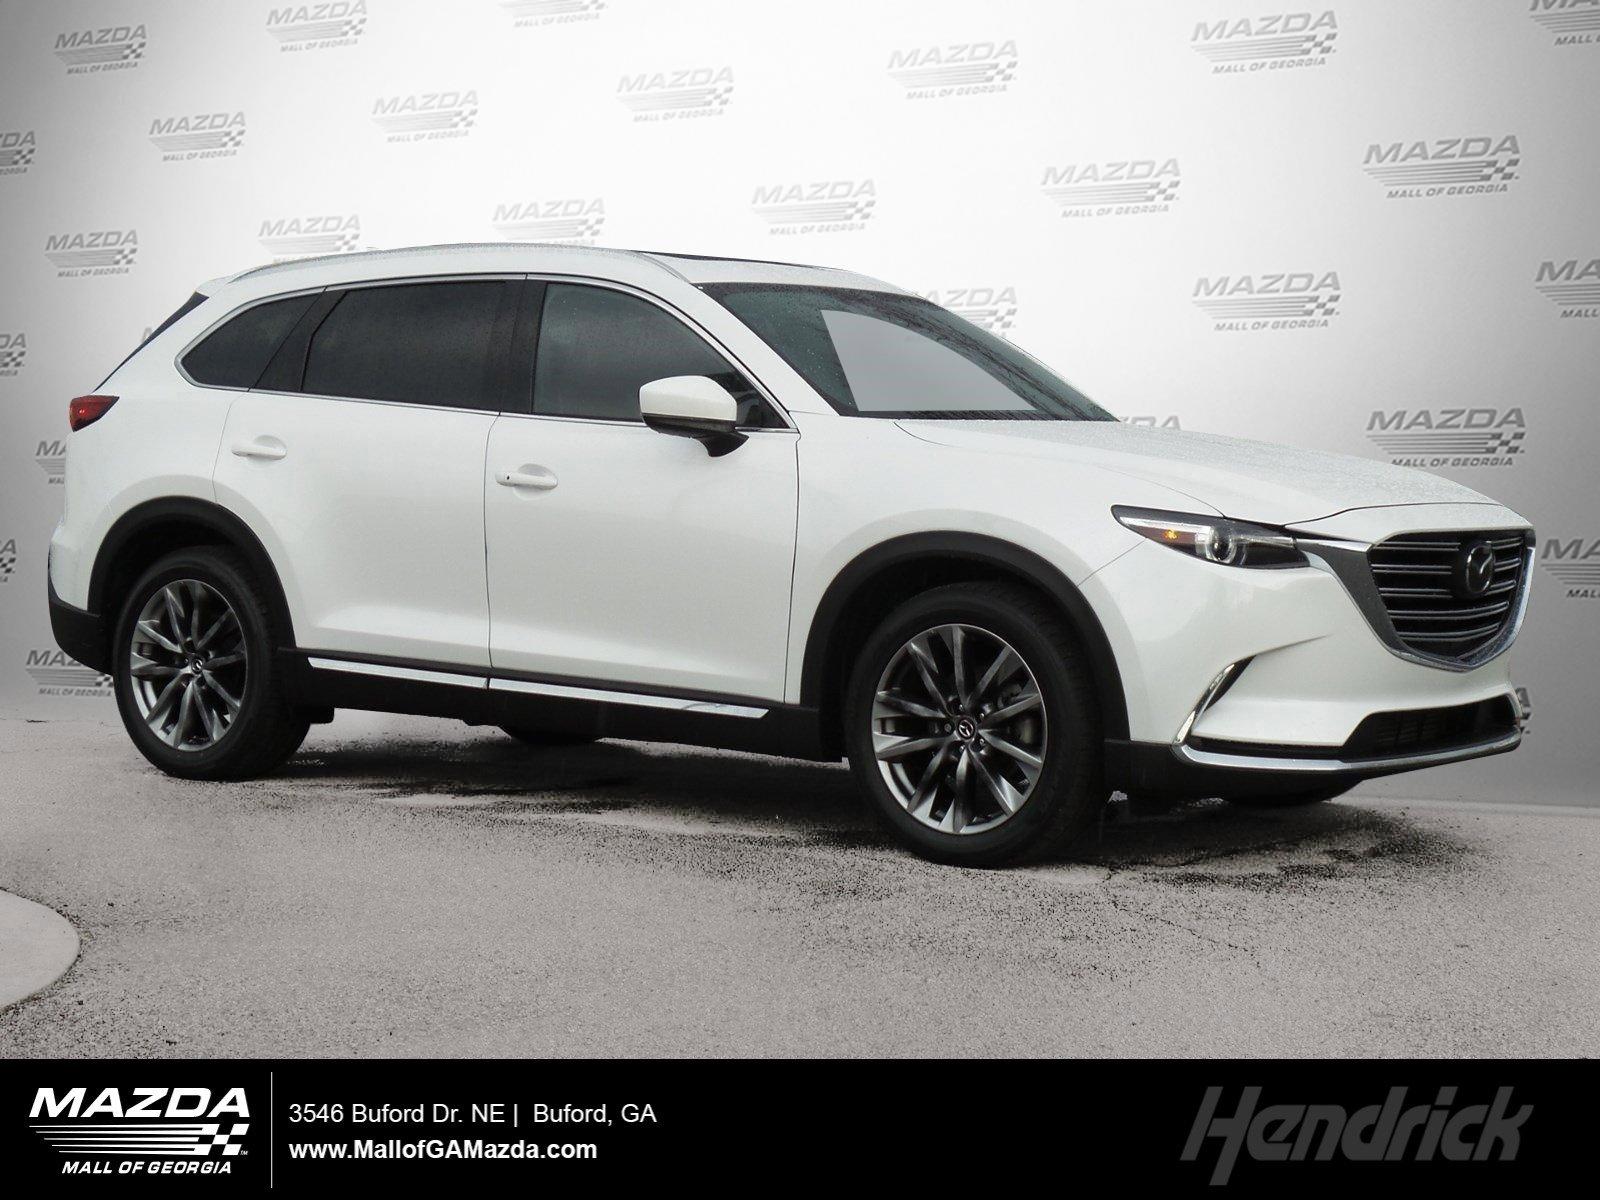 Certified Pre-Owned 2016 Mazda CX-9 Signature